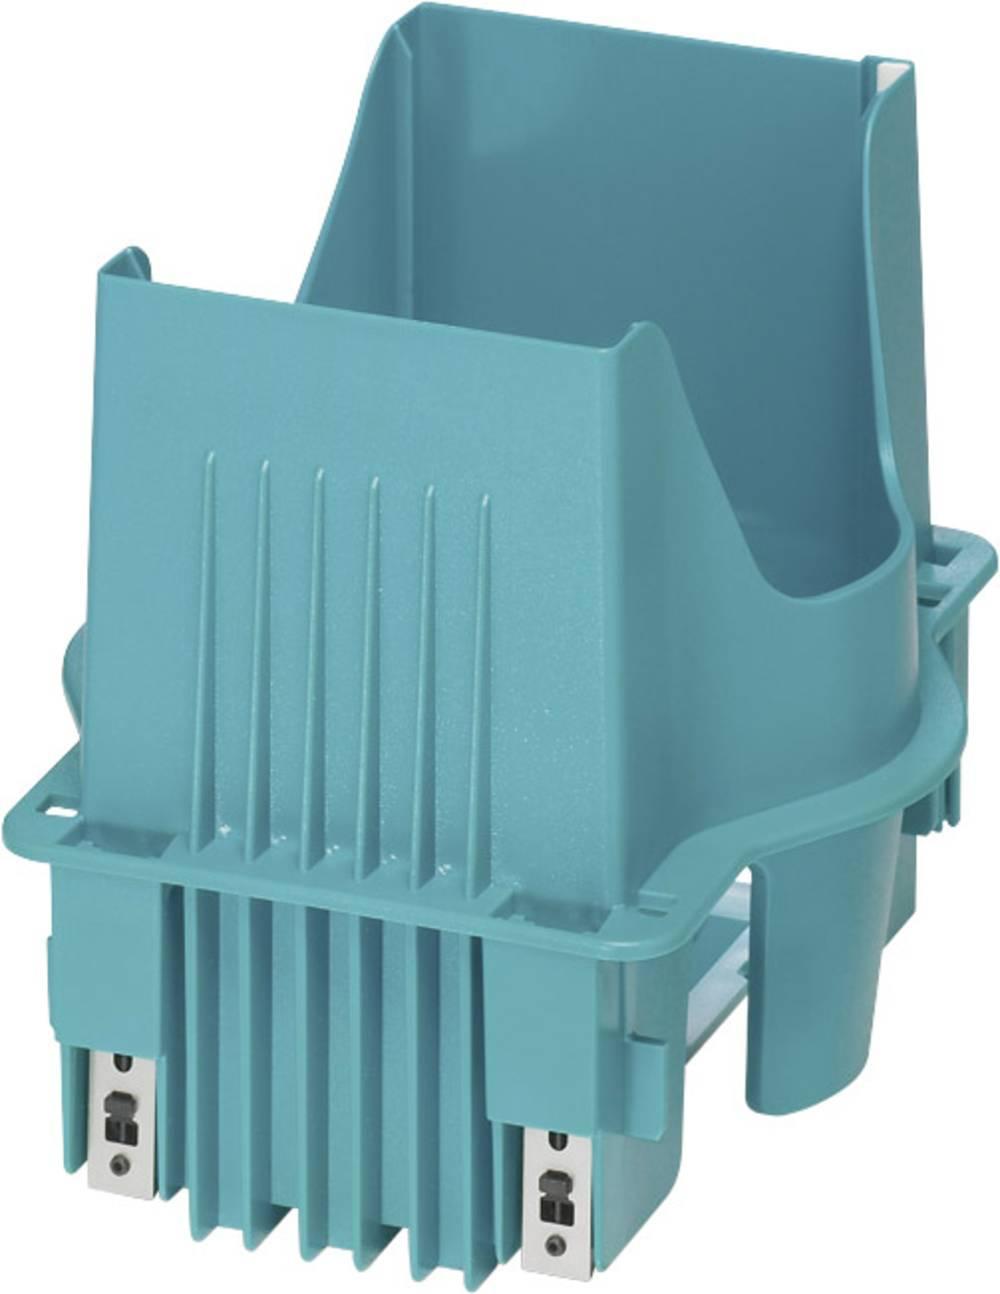 Magasin til Bluemark-printer Phoenix Contact BLUEMARK CLED-MAG 20 5146655 1 stk